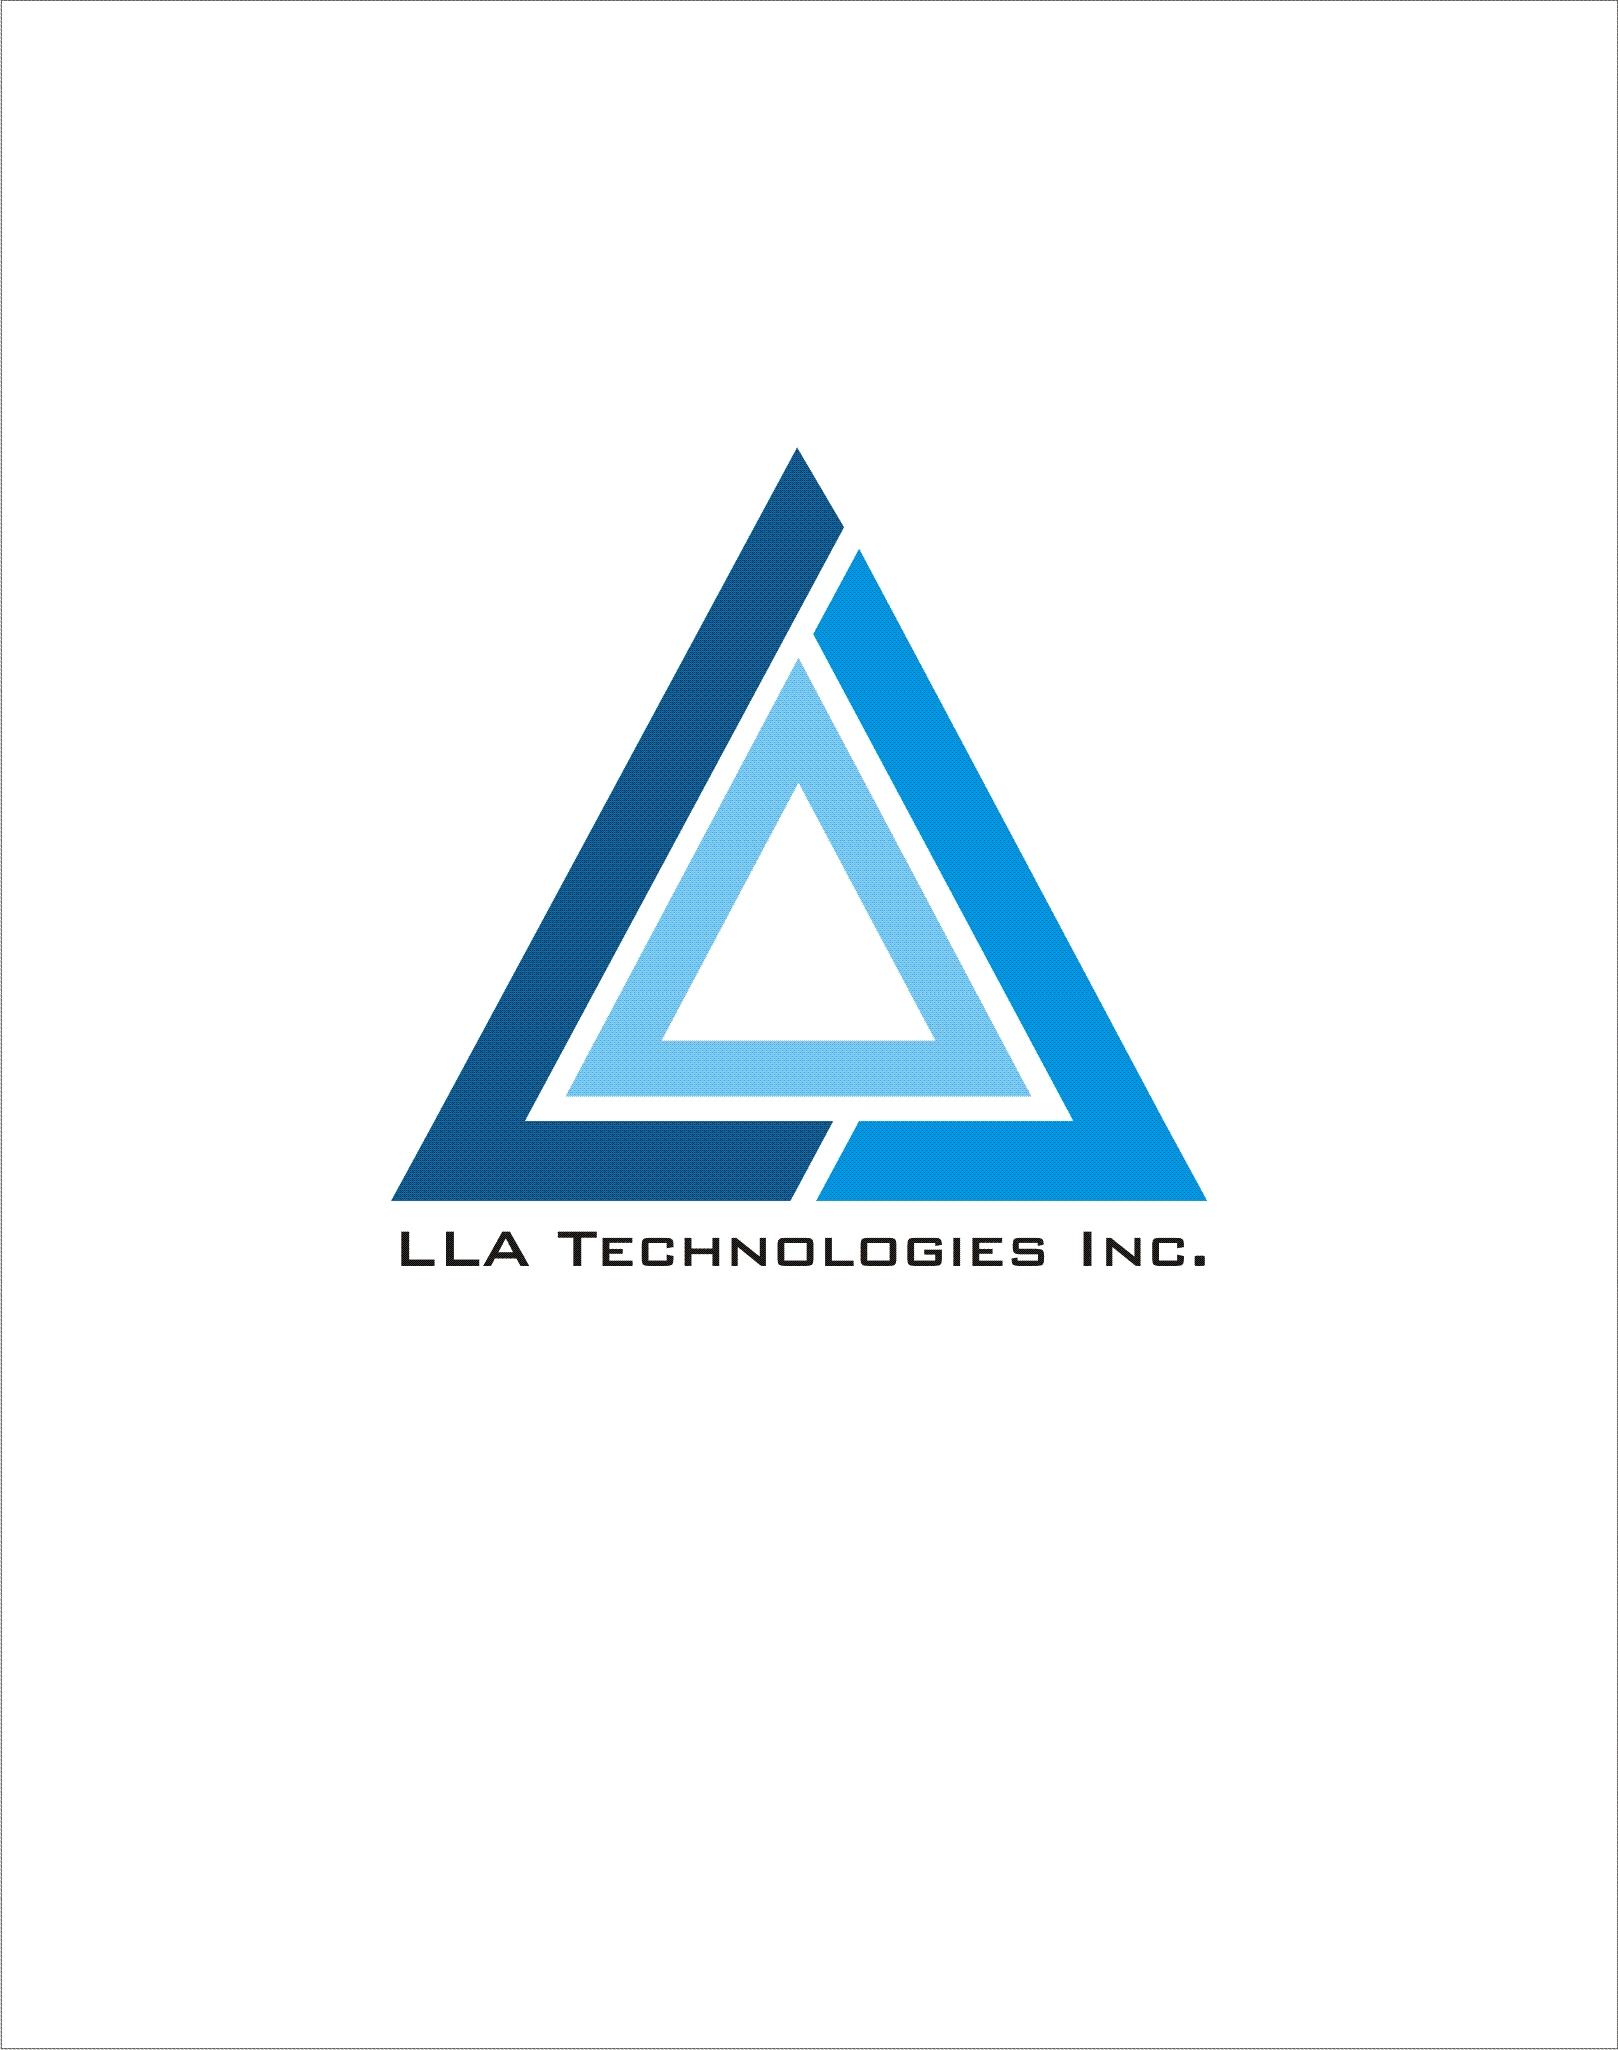 Logo Design by Chandra Sasmita Tommy - Entry No. 132 in the Logo Design Contest Inspiring Logo Design for LLA Technologies Inc..